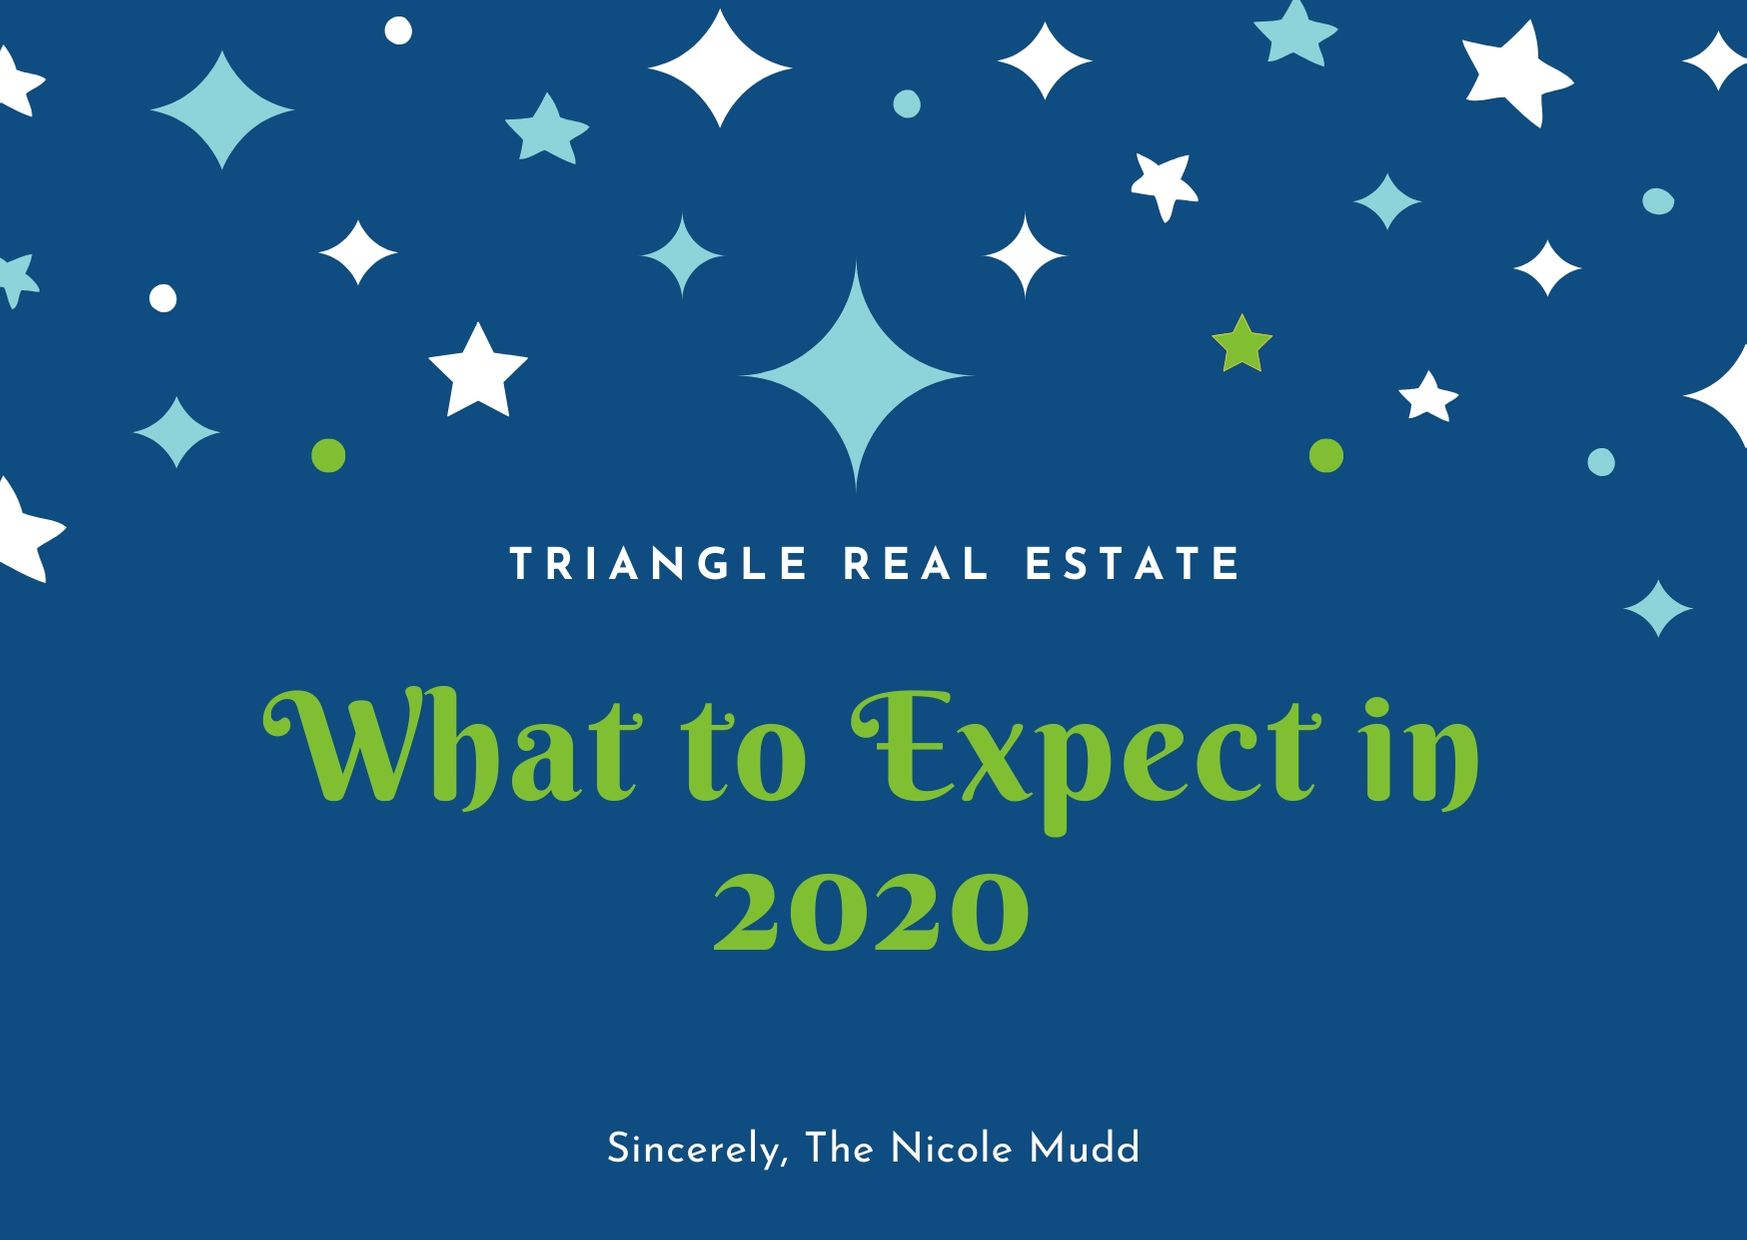 Happy 2020 from Nicole Mudd